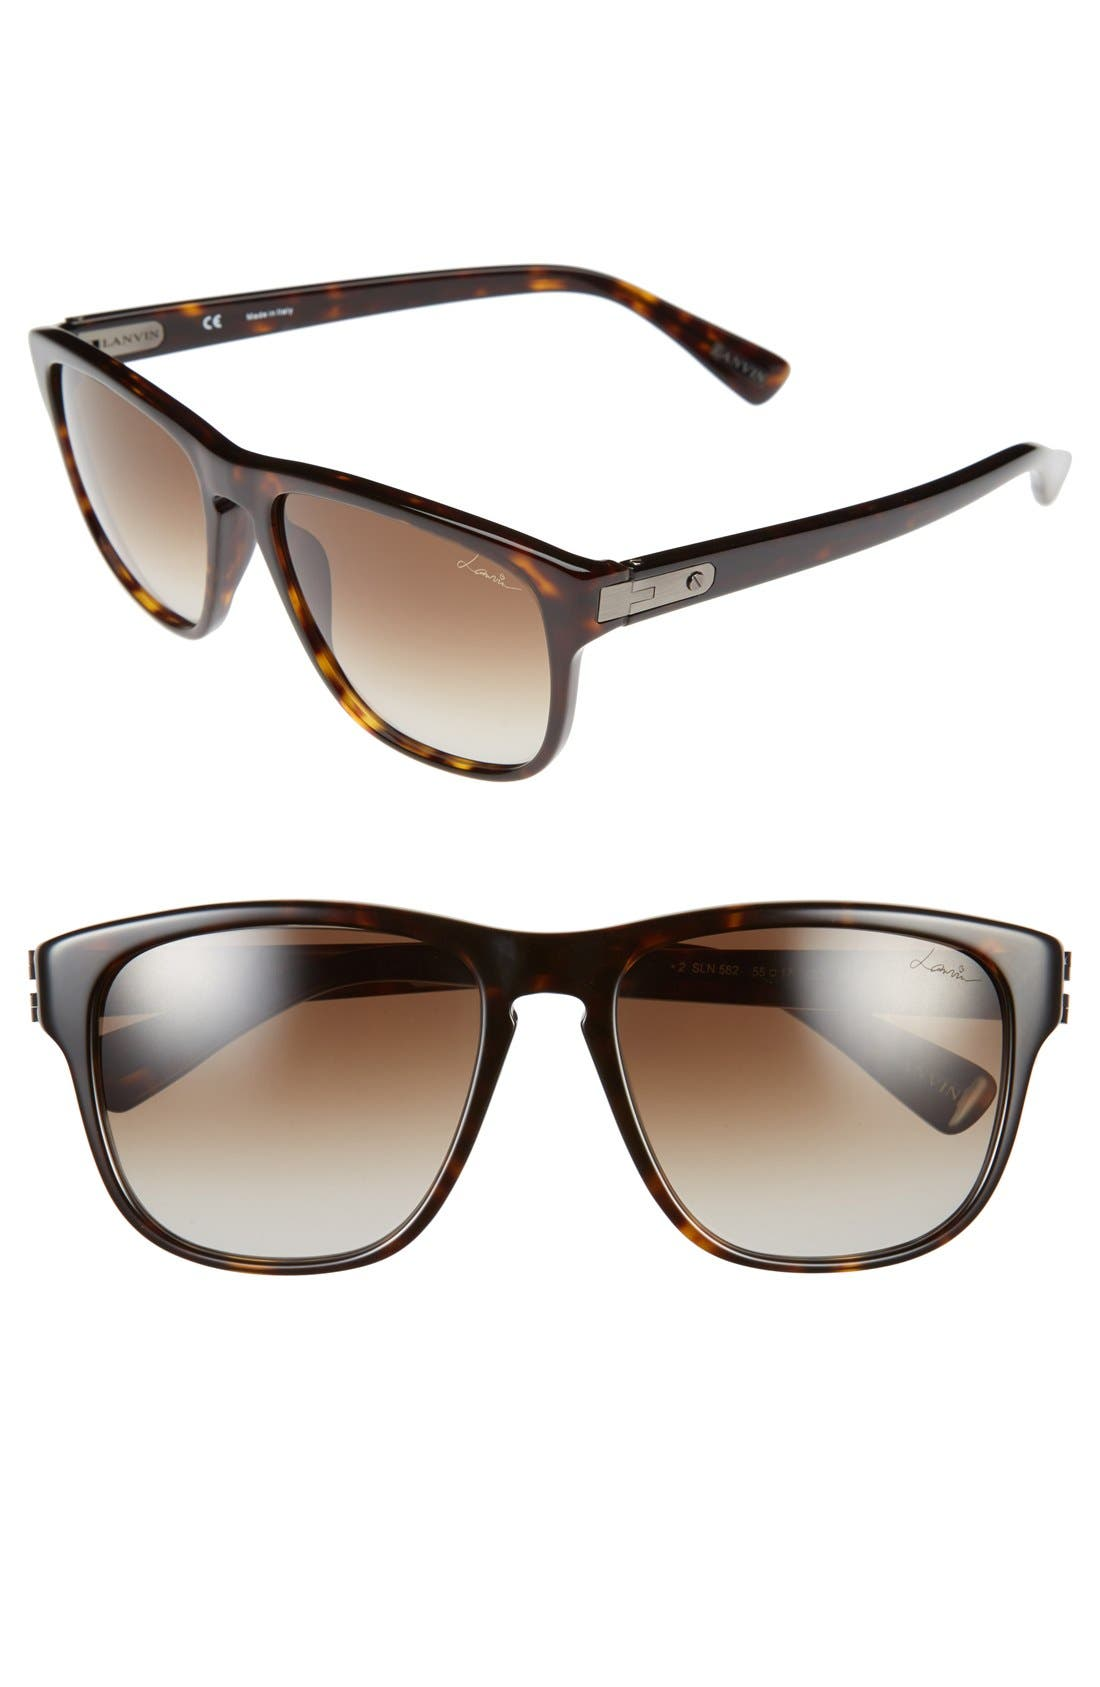 Alternate Image 1 Selected - Lanvin 55mm Retro Sunglasses